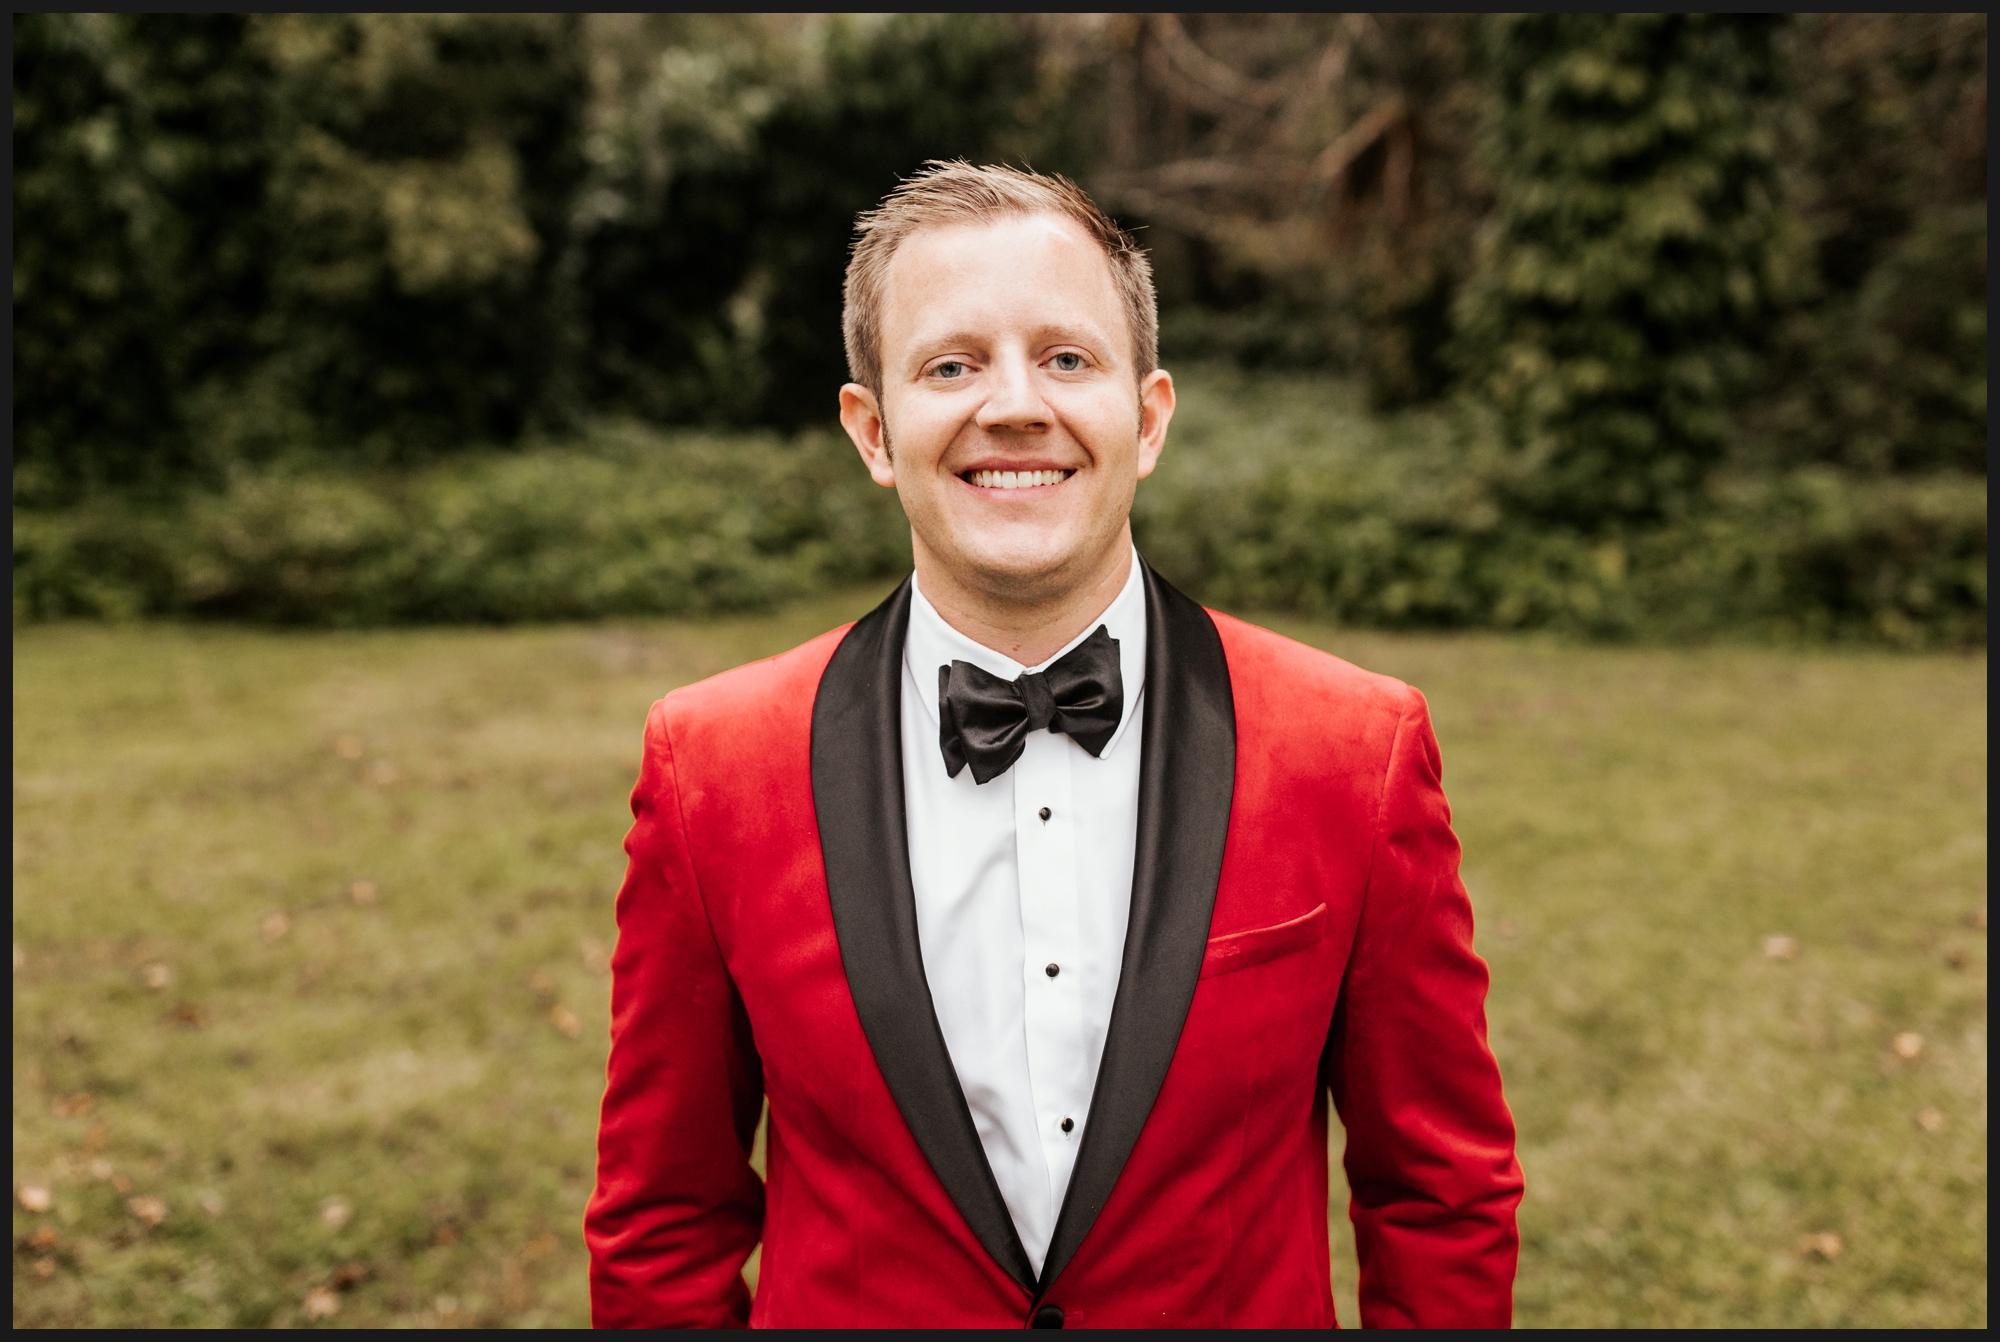 Orlando-Wedding-Photographer-destination-wedding-photographer-florida-wedding-photographer-hawaii-wedding-photographer_0532.jpg